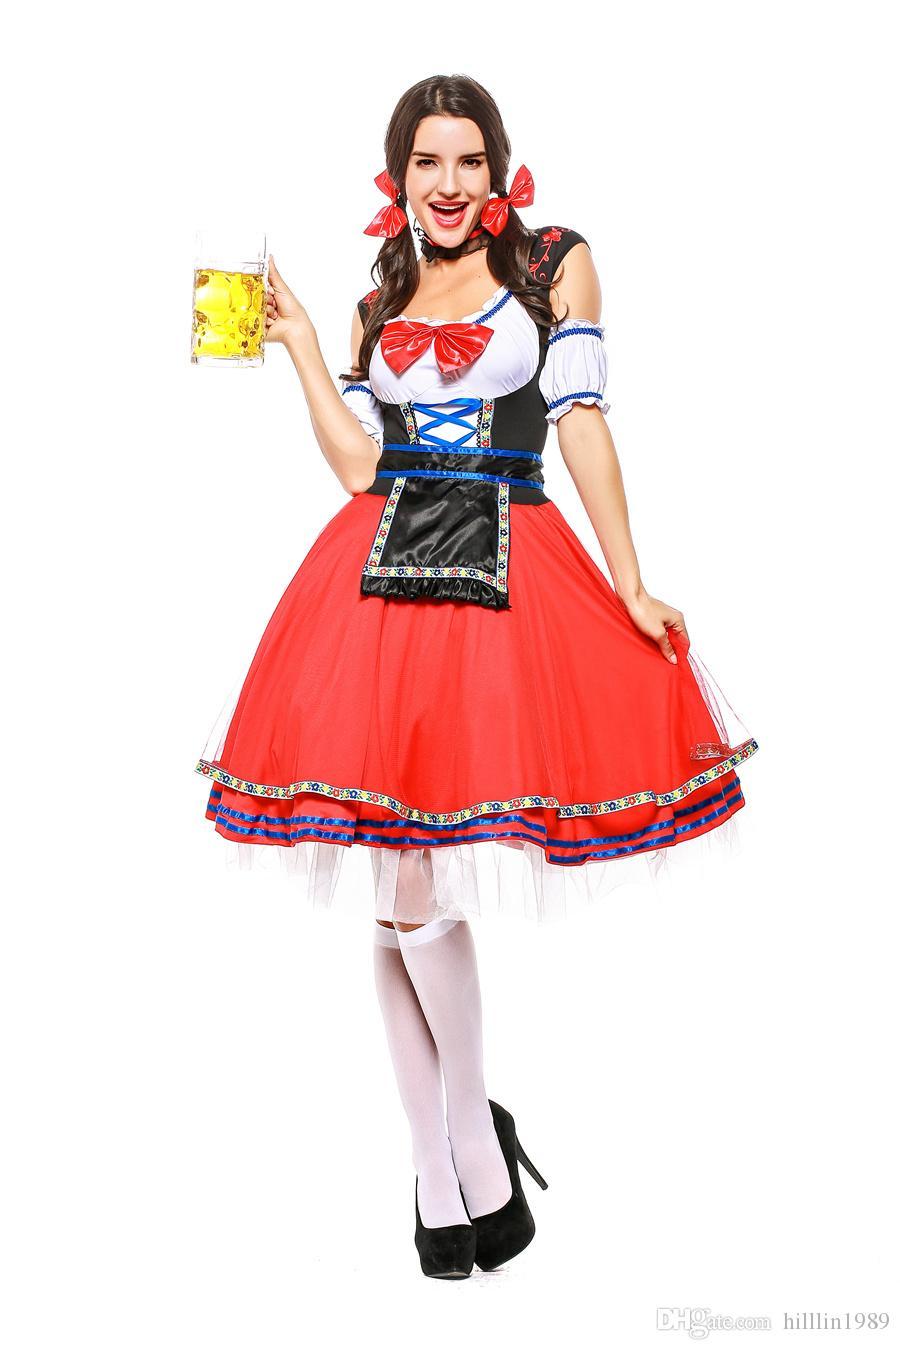 Sexy Women Red Short Original Bavarian Beer Girl Costume Carnival European Traditional Cosplay Fancy Dress German Oktoberfest Uniform